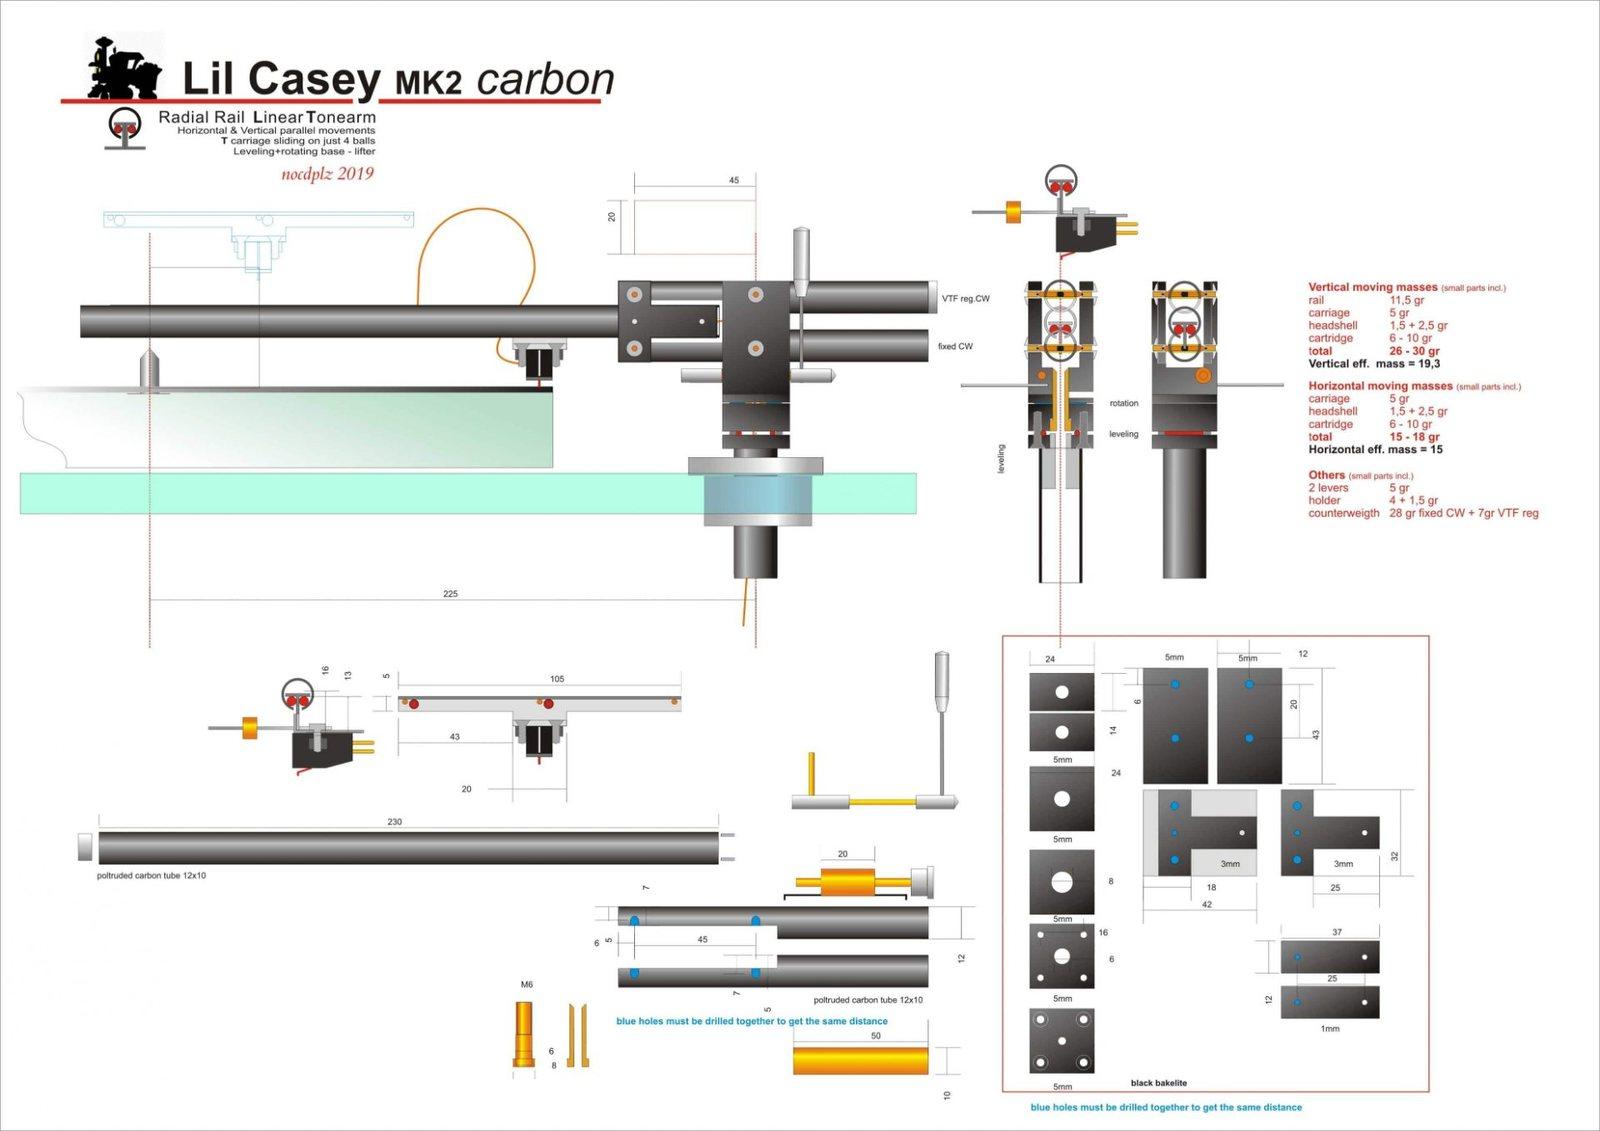 L CASEY MK2  DES-min.jpg